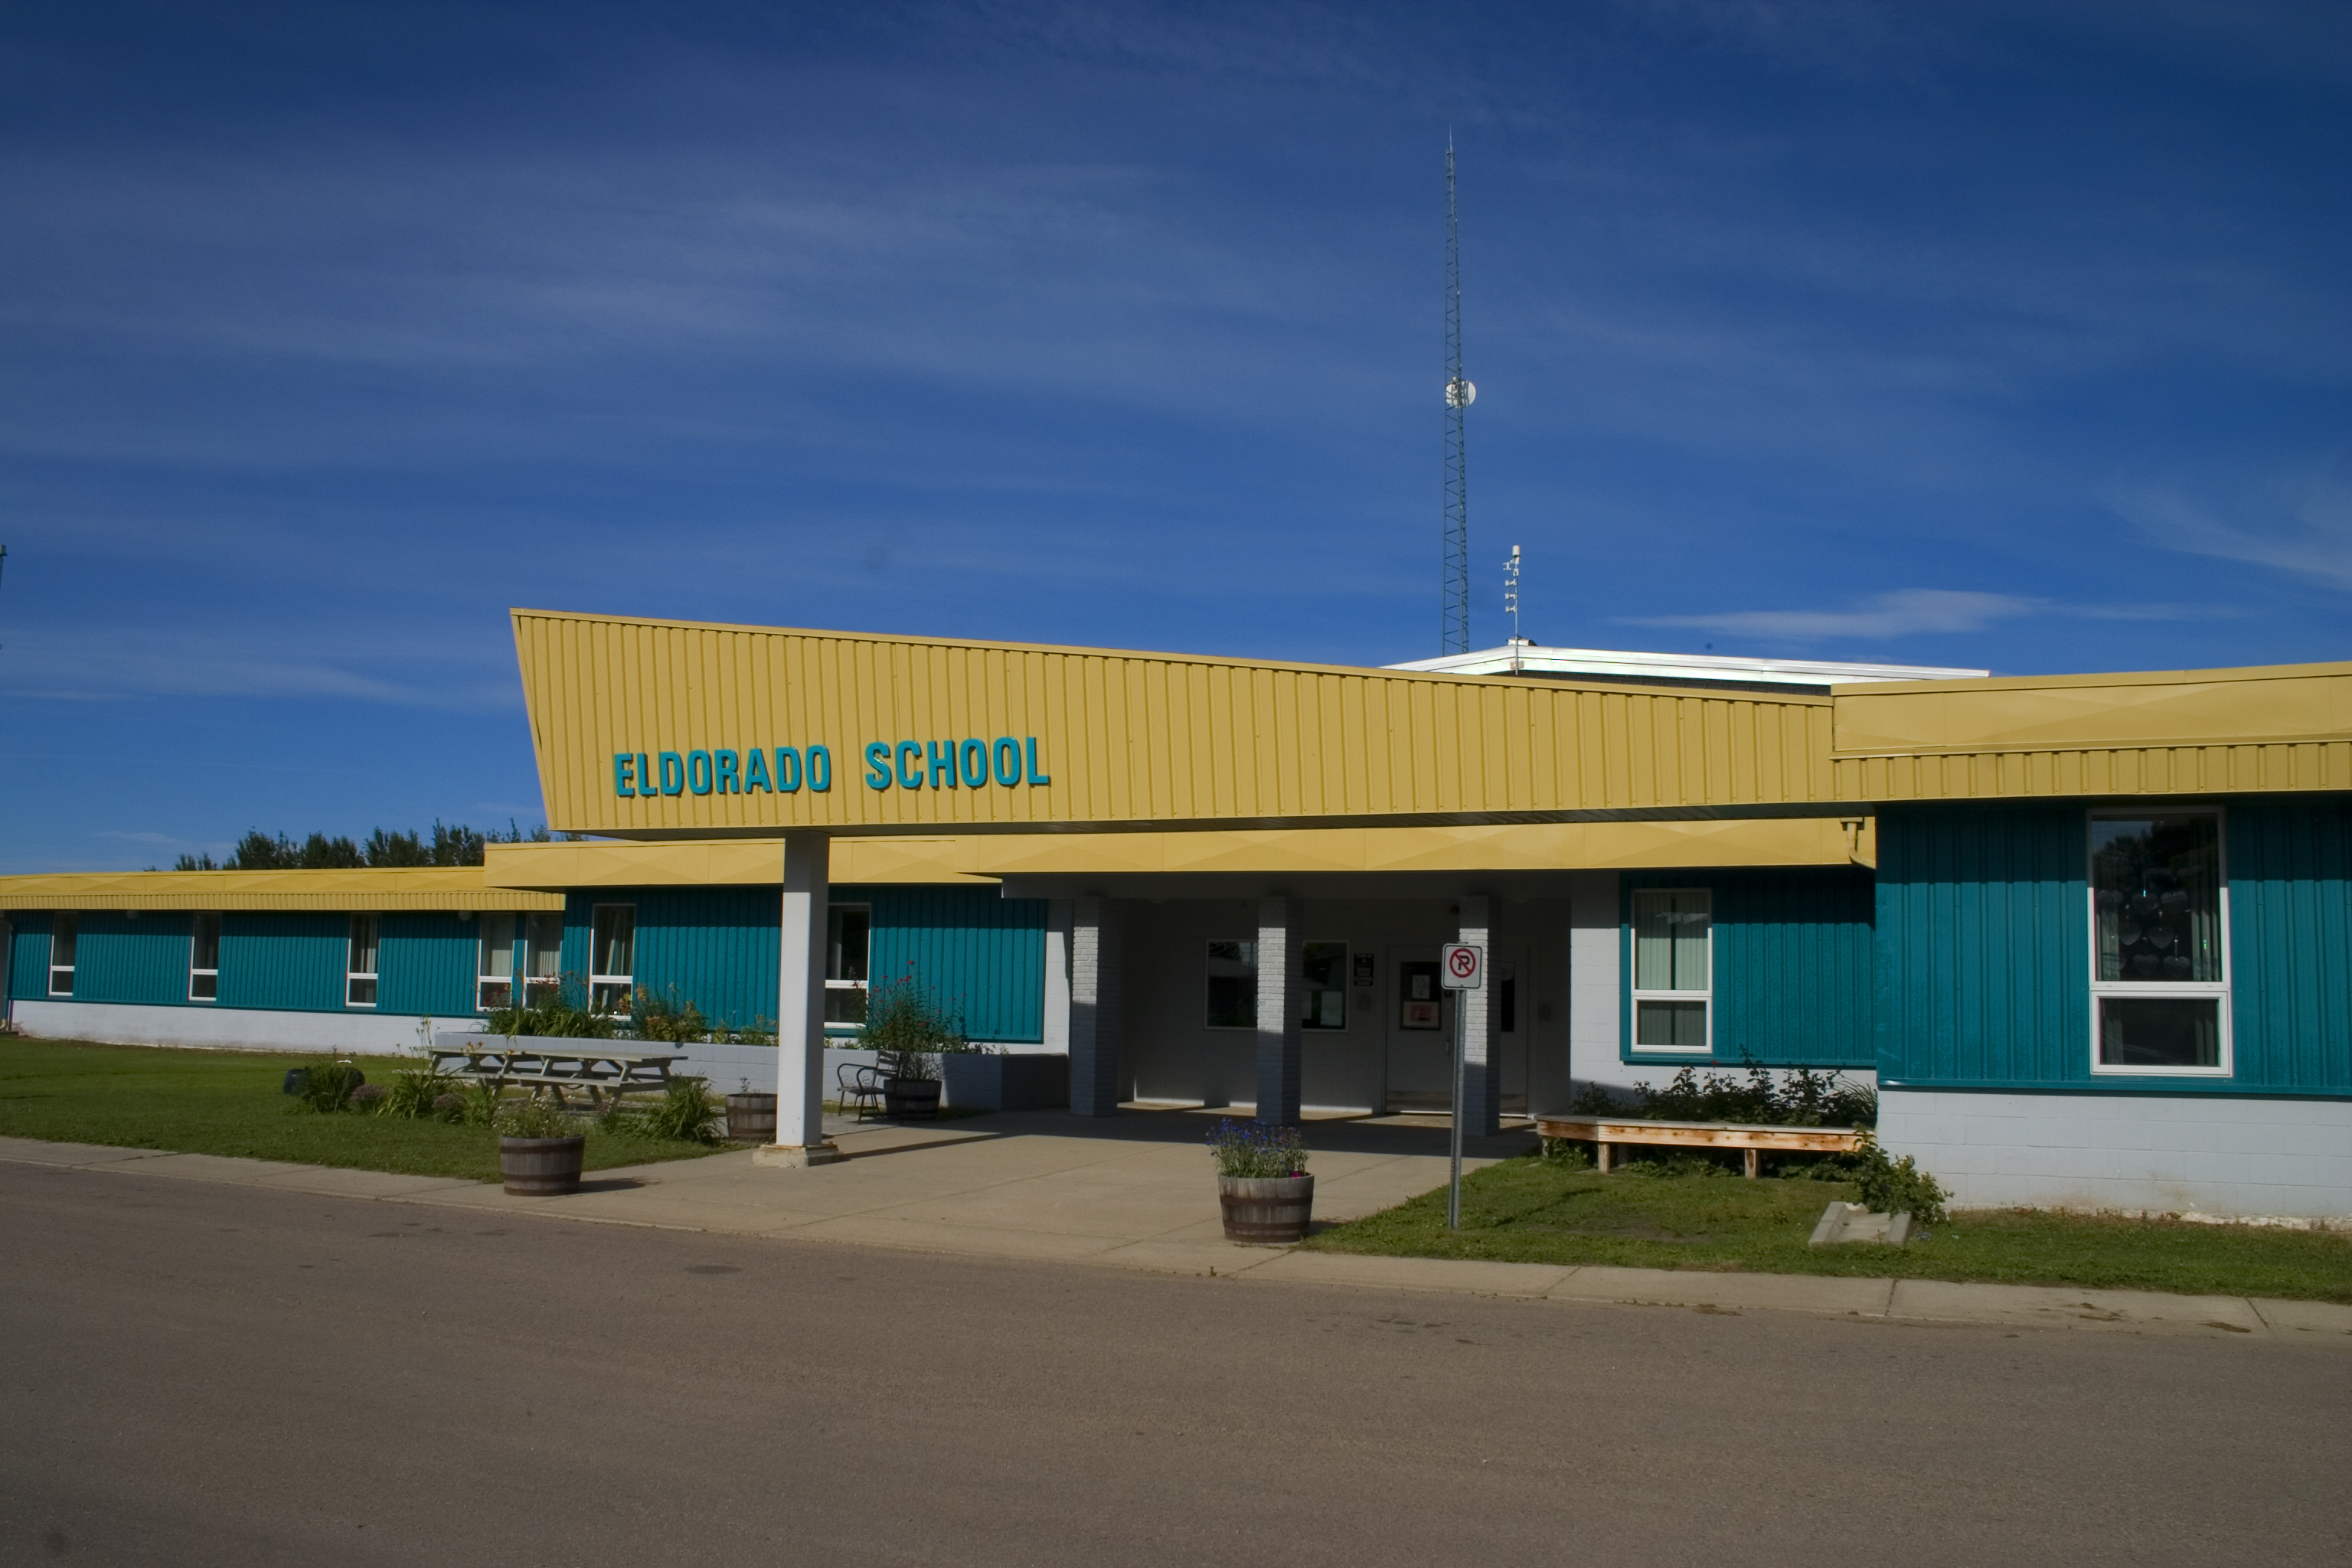 Eldorado Elementary School